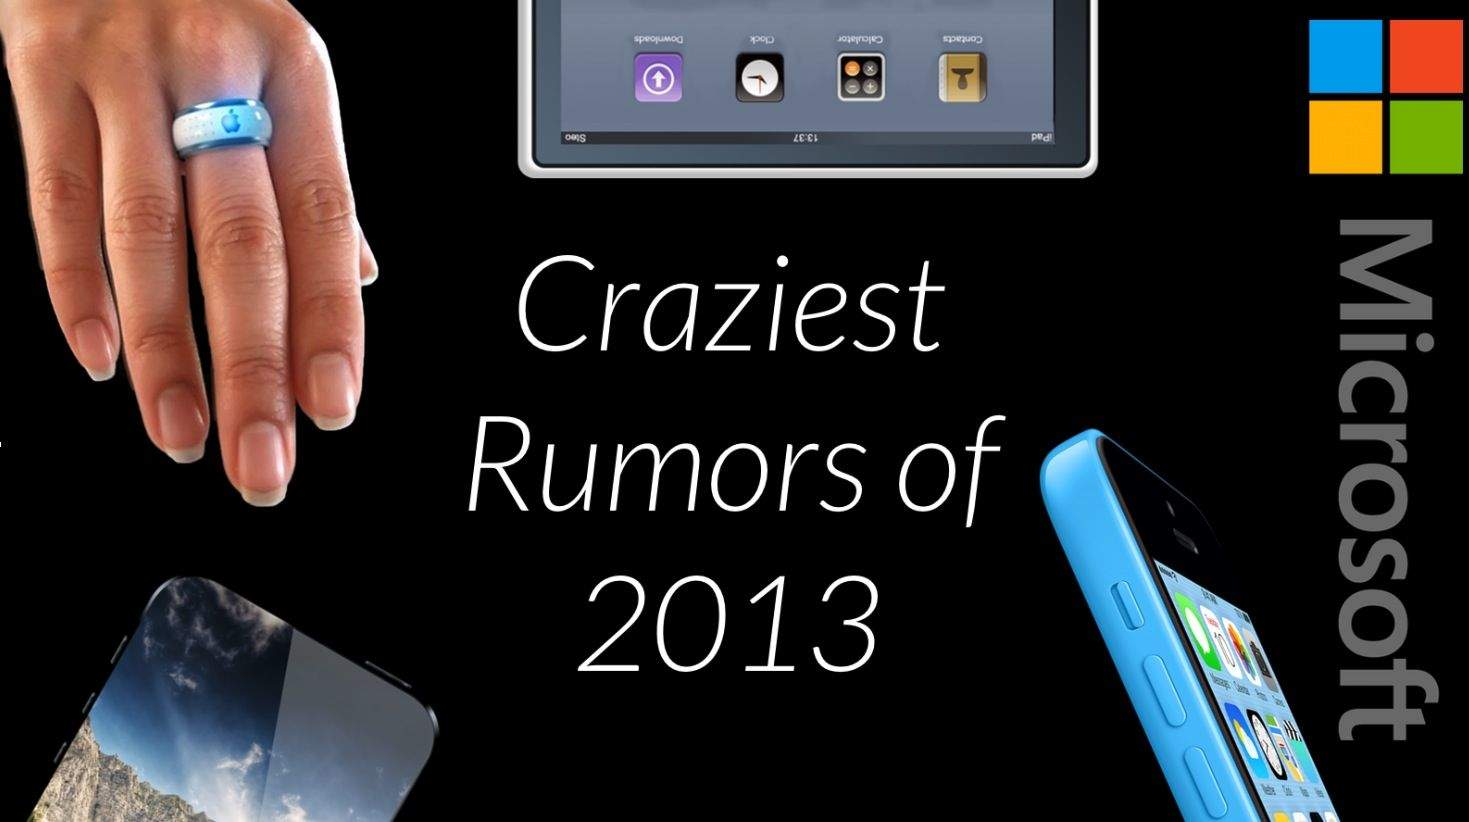 Craziest-rumors-2013